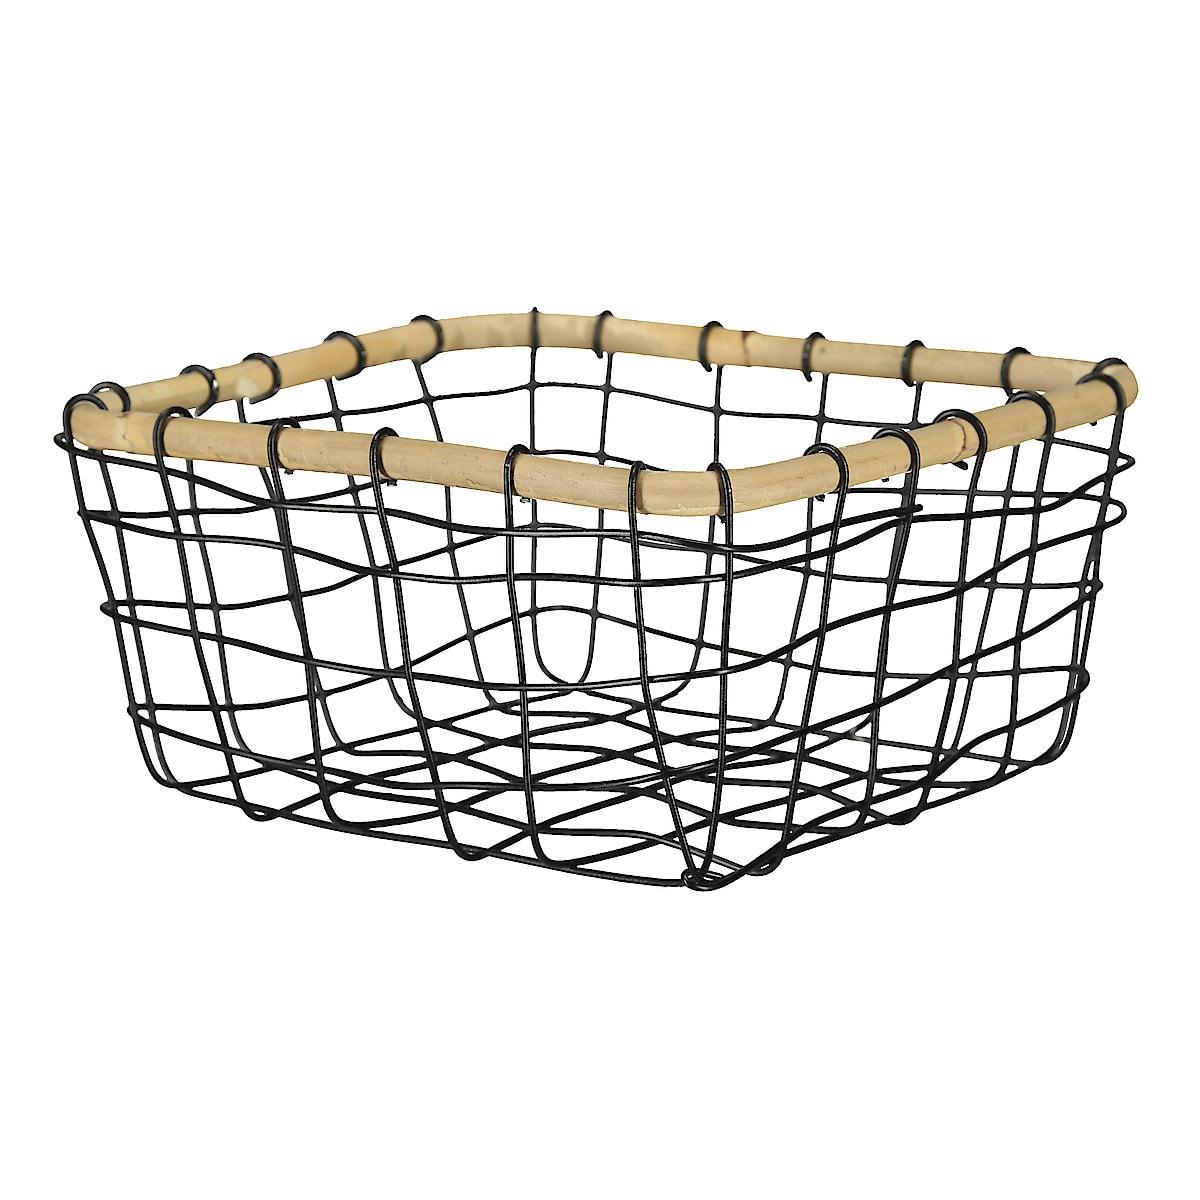 Trådkorg metall/rotting